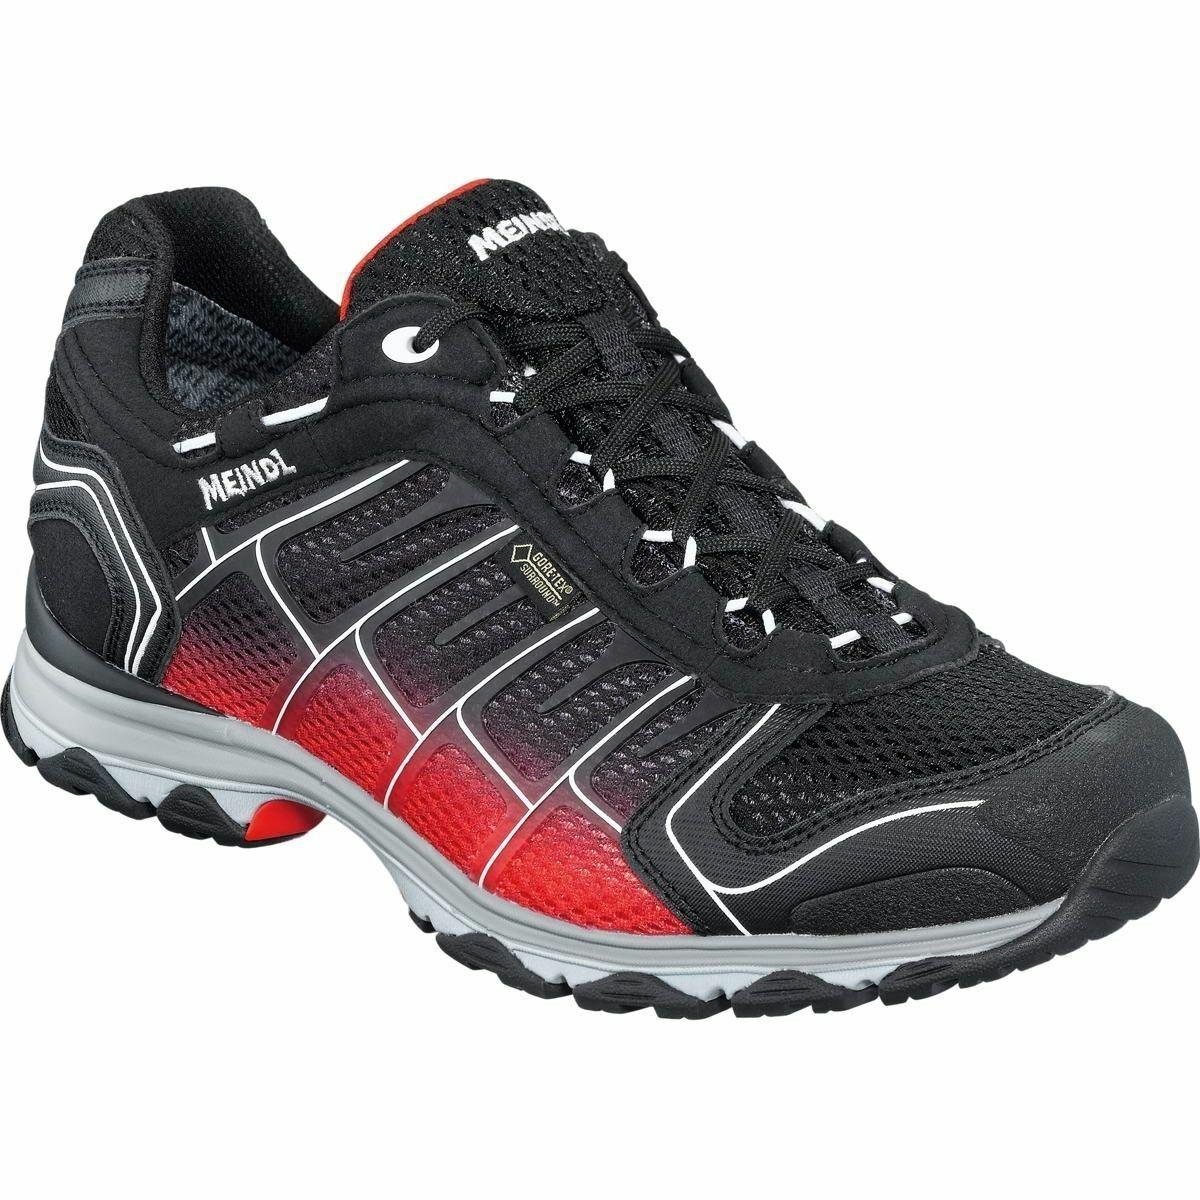 Meindl X - so 30 GTX ® (3982) - Hiking schuhe Trekking schuhe Herren